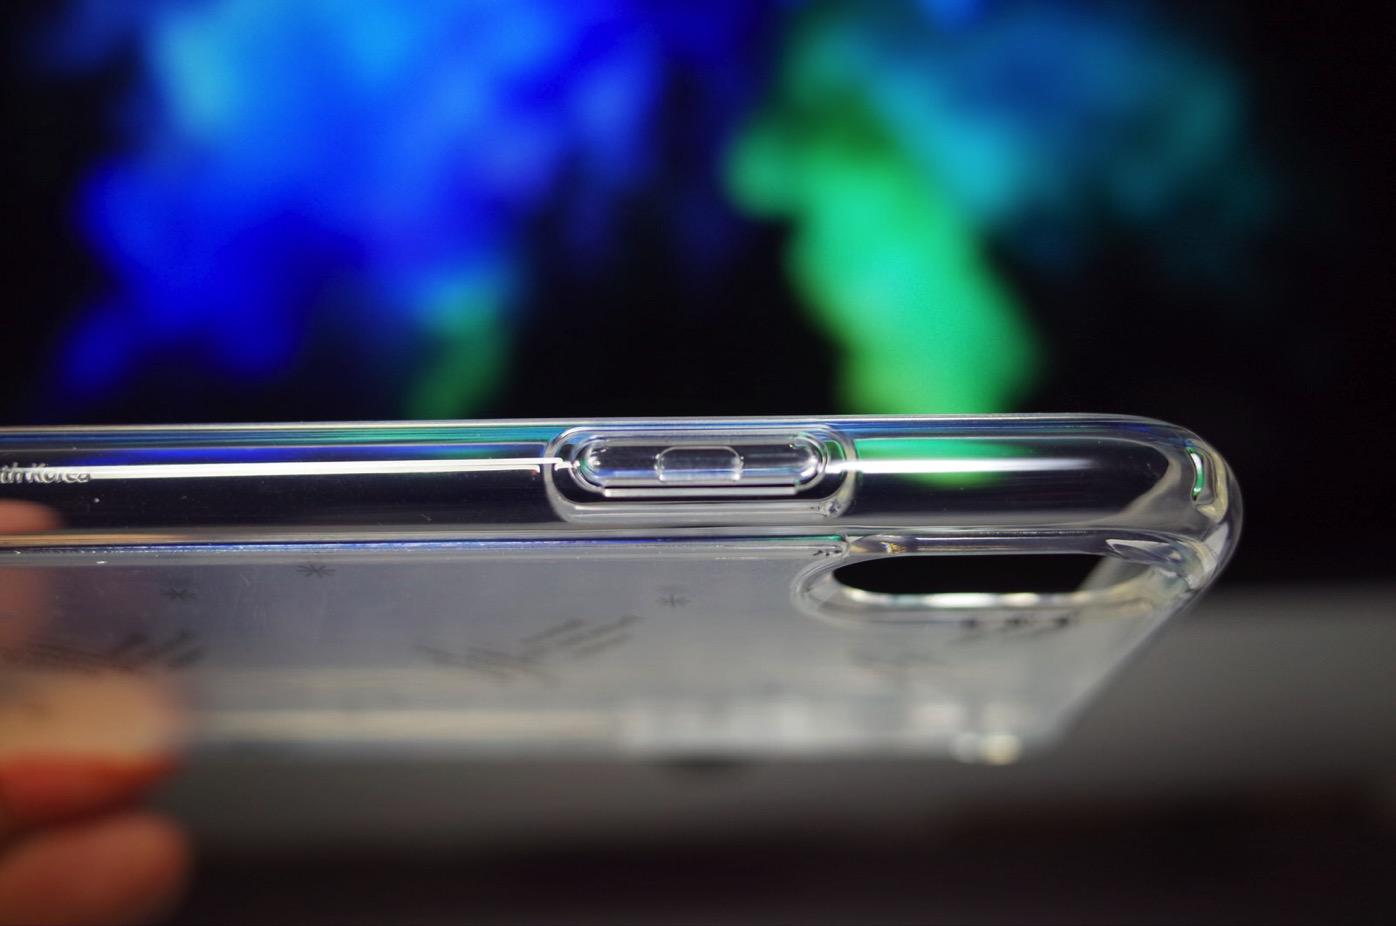 【Spigen】iPhone X ケース, [ 米軍MIL規格取得 落下 衝撃 吸収 ] ウルトラ・ハイブリッド アイフォン X 用 耐衝撃 カバー-8